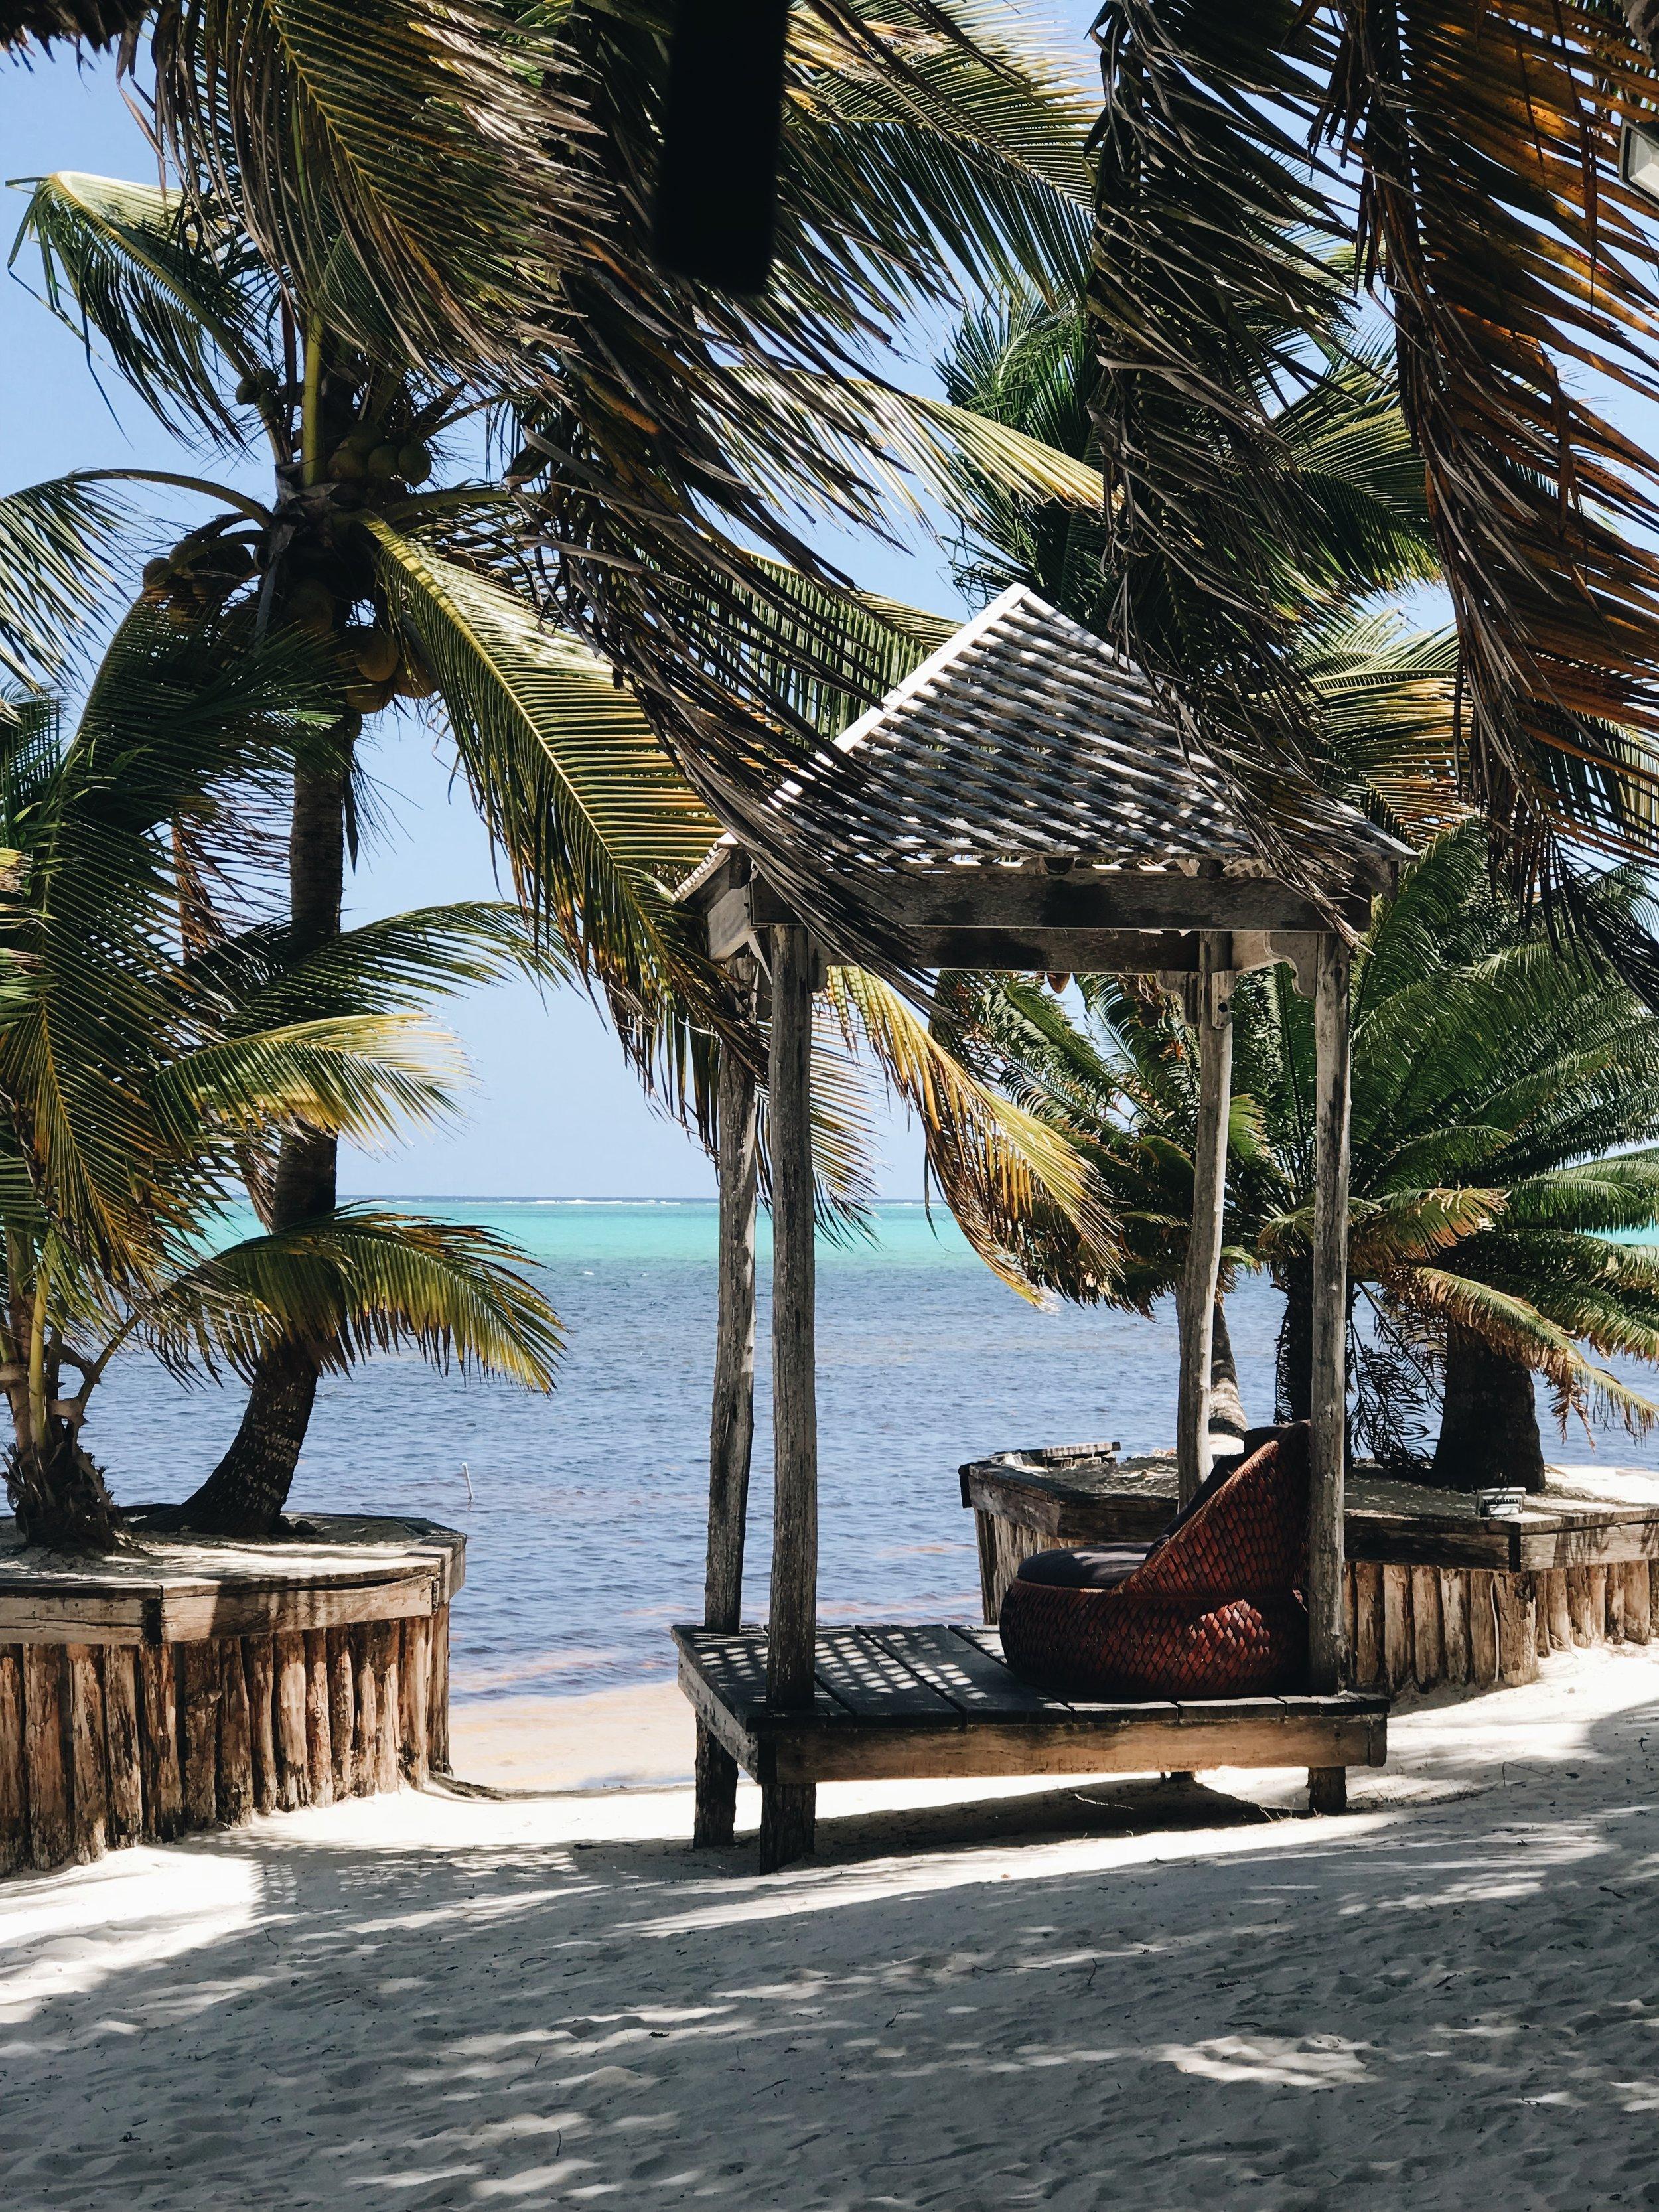 Matachica Resort - Belize   Honeymoon Package and Travel Guide